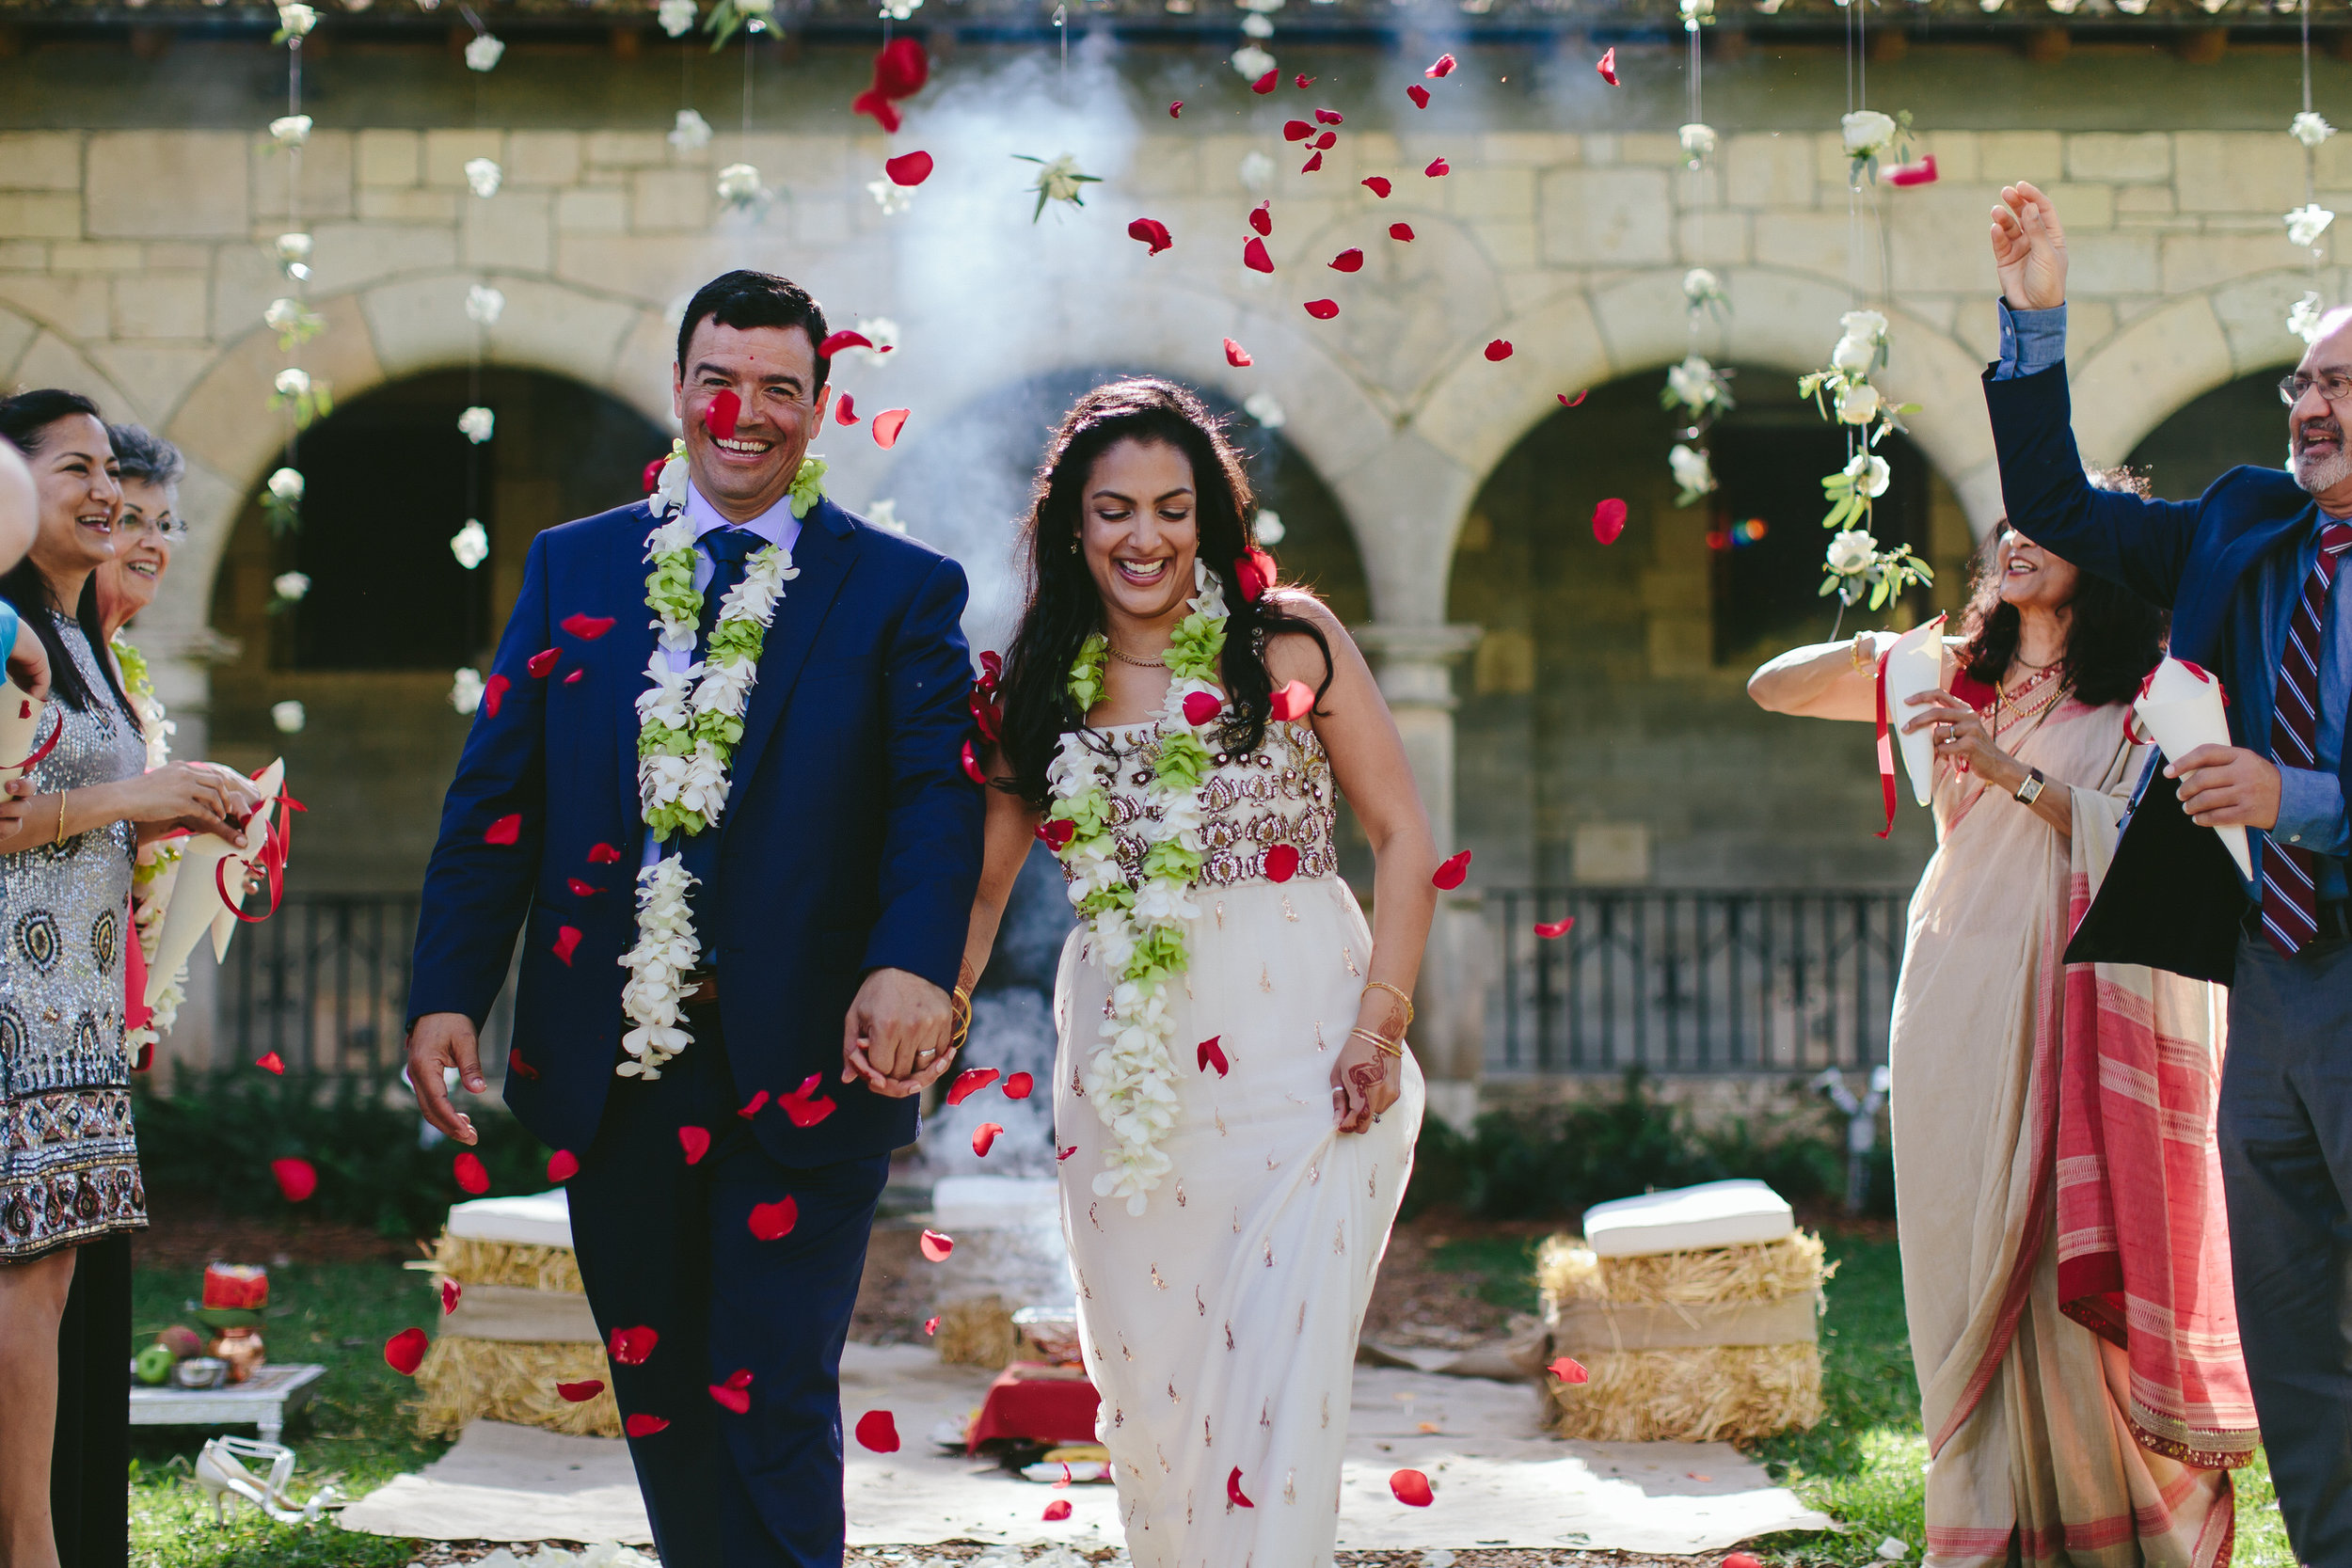 flower-bombs-ceremony-exit-tiny-house-photo.jpg